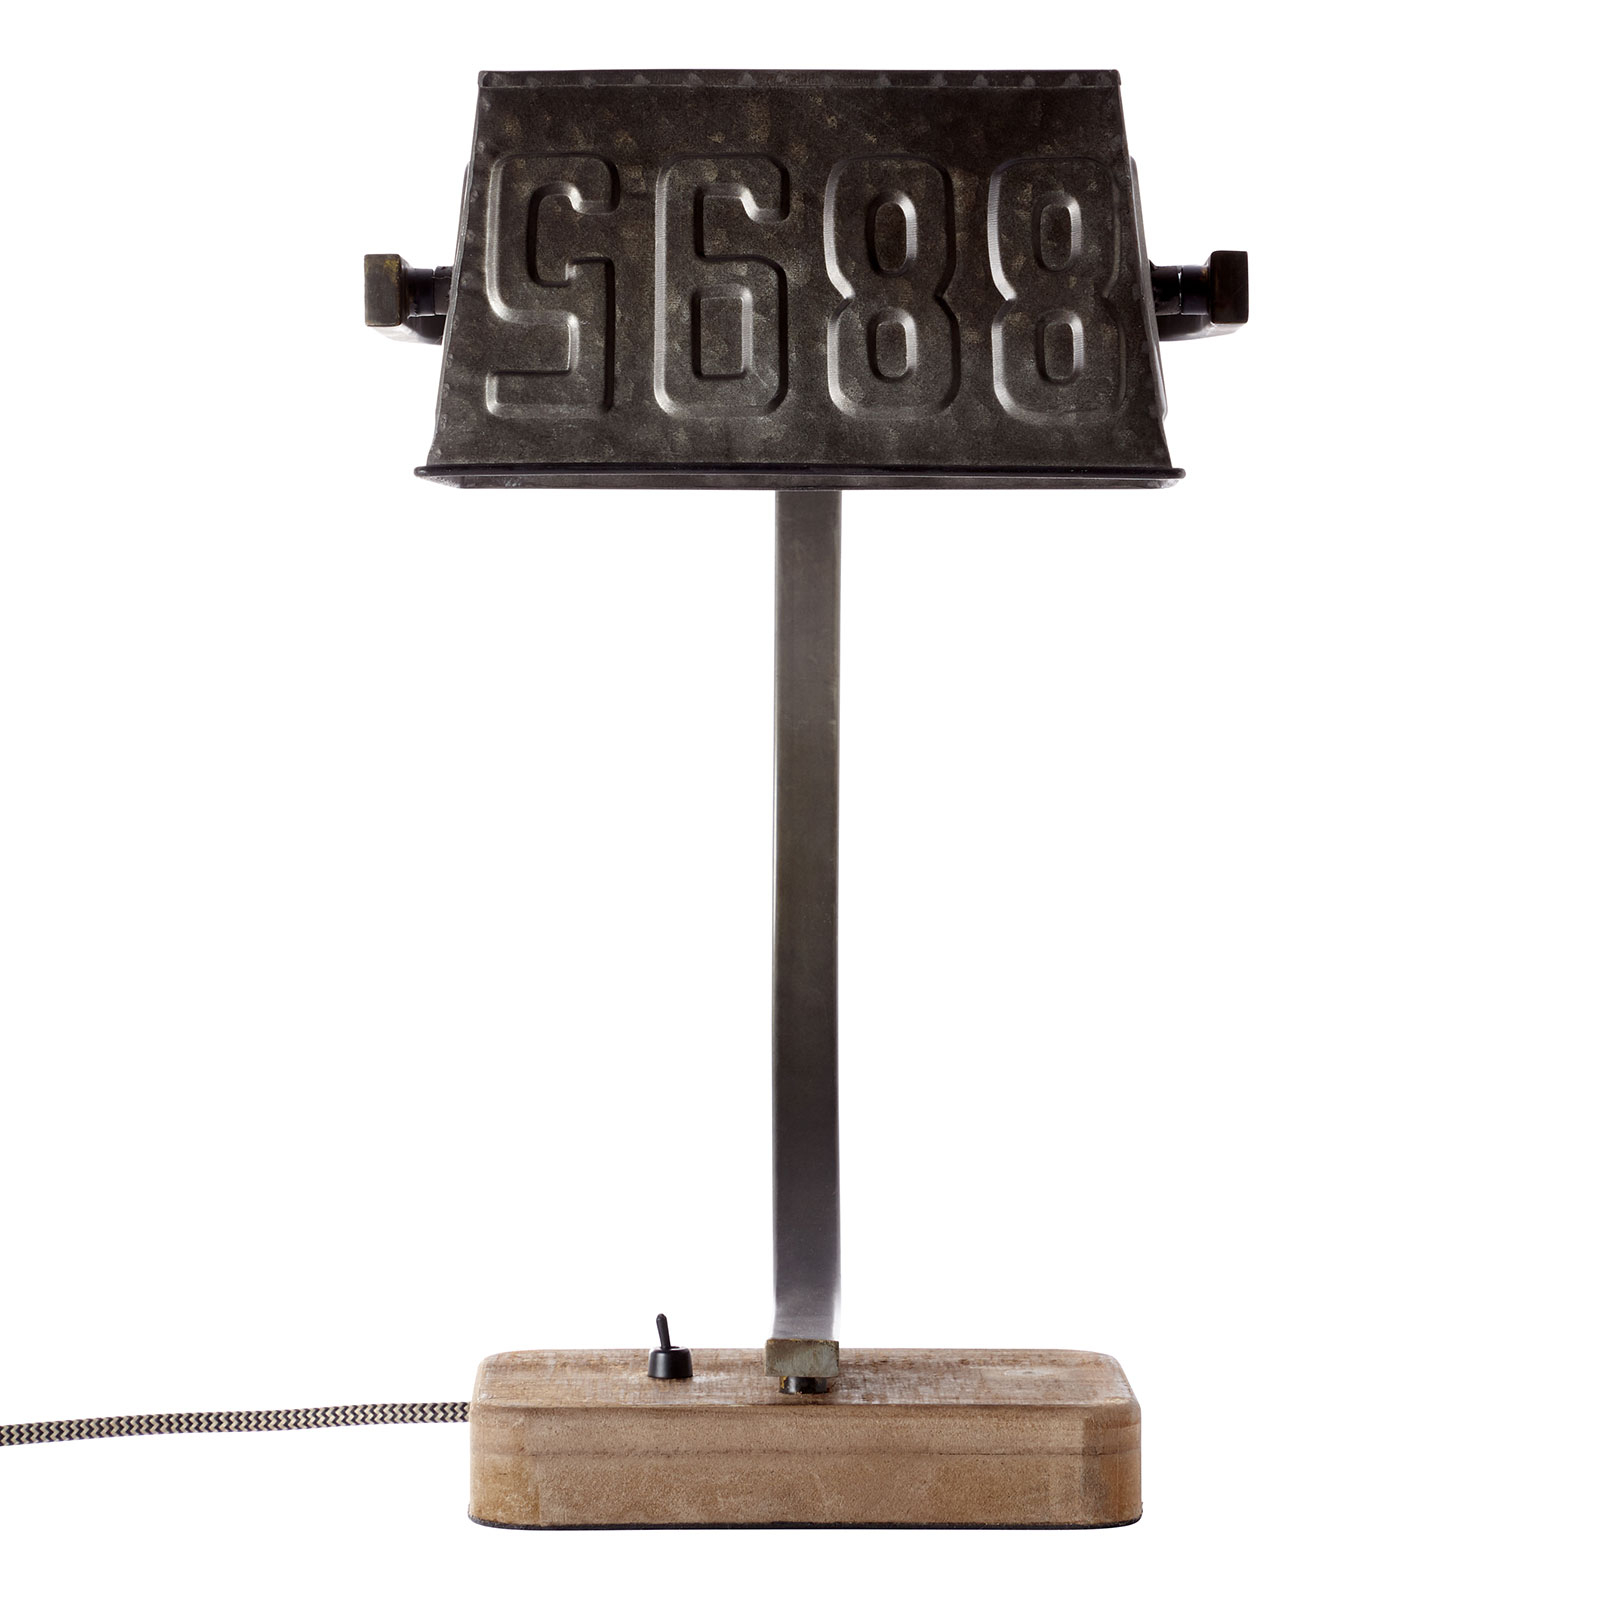 Metall Tischleuchte Drake mit Holzfuß